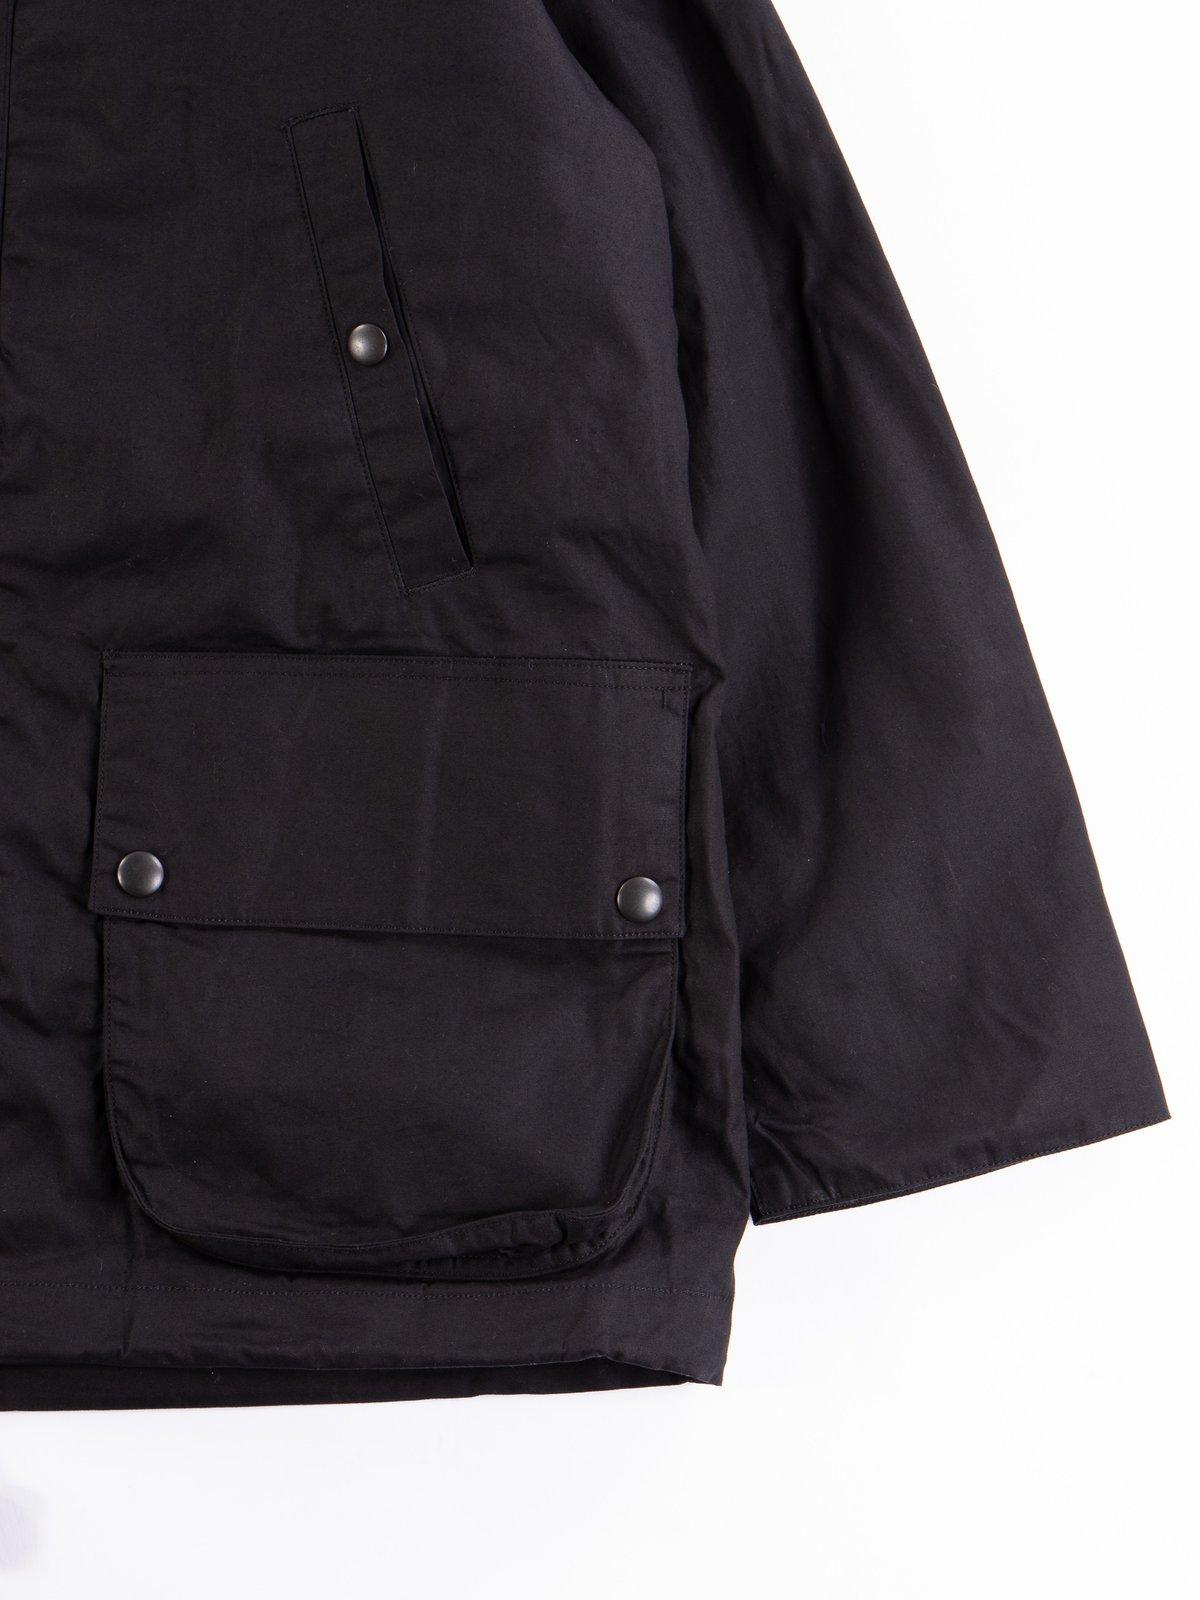 Black British Field Hooded Jacket - Image 3